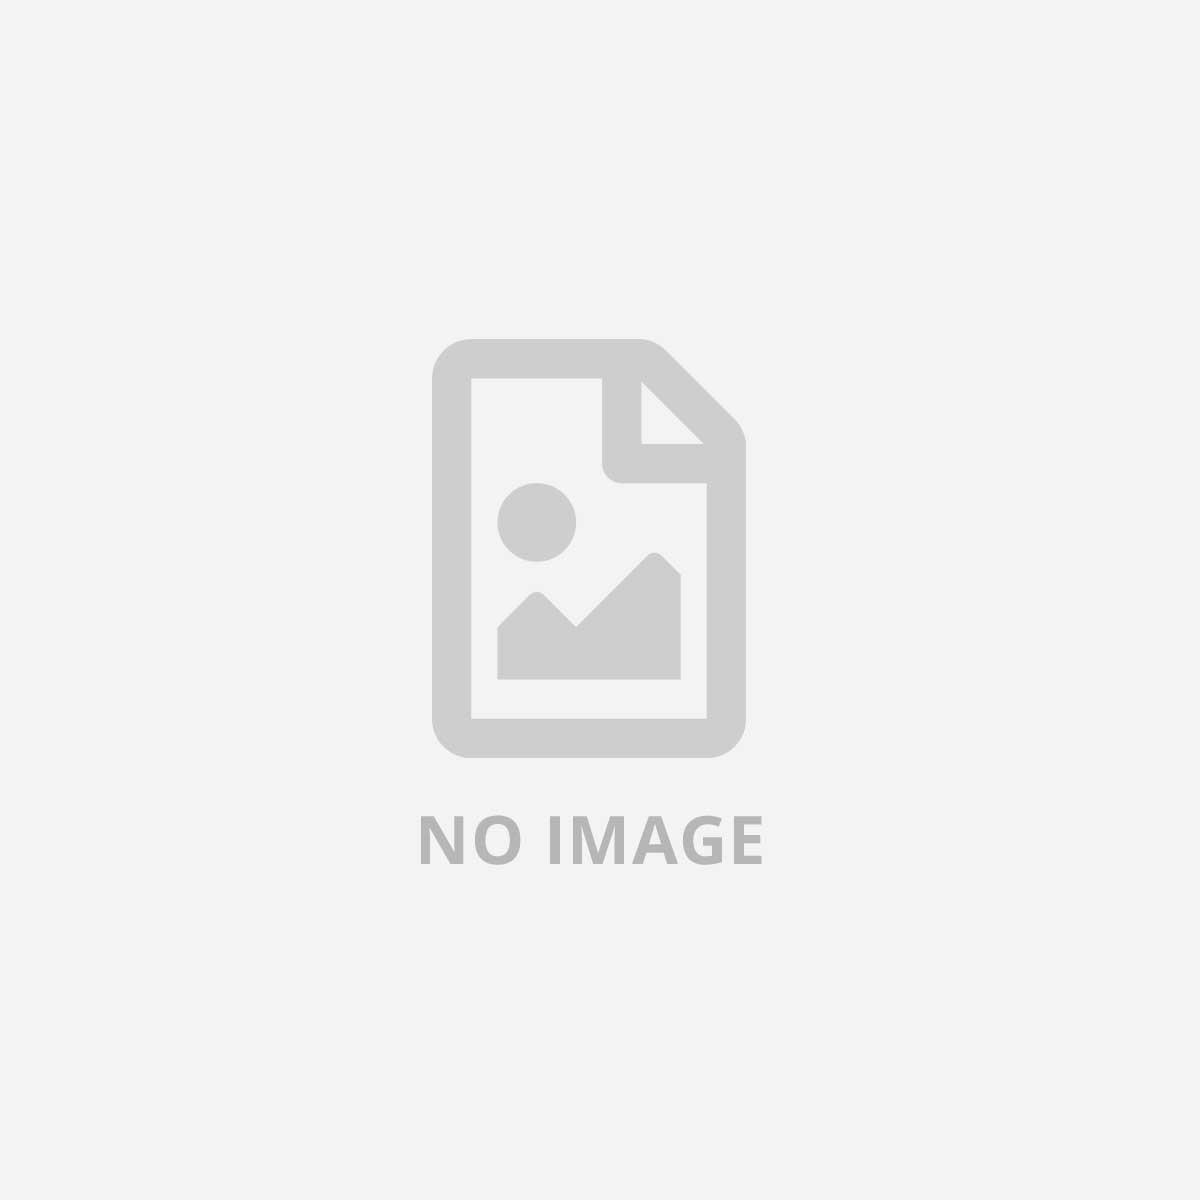 NETGEAR SW 24 P 10/100/1000 MBPS RACK